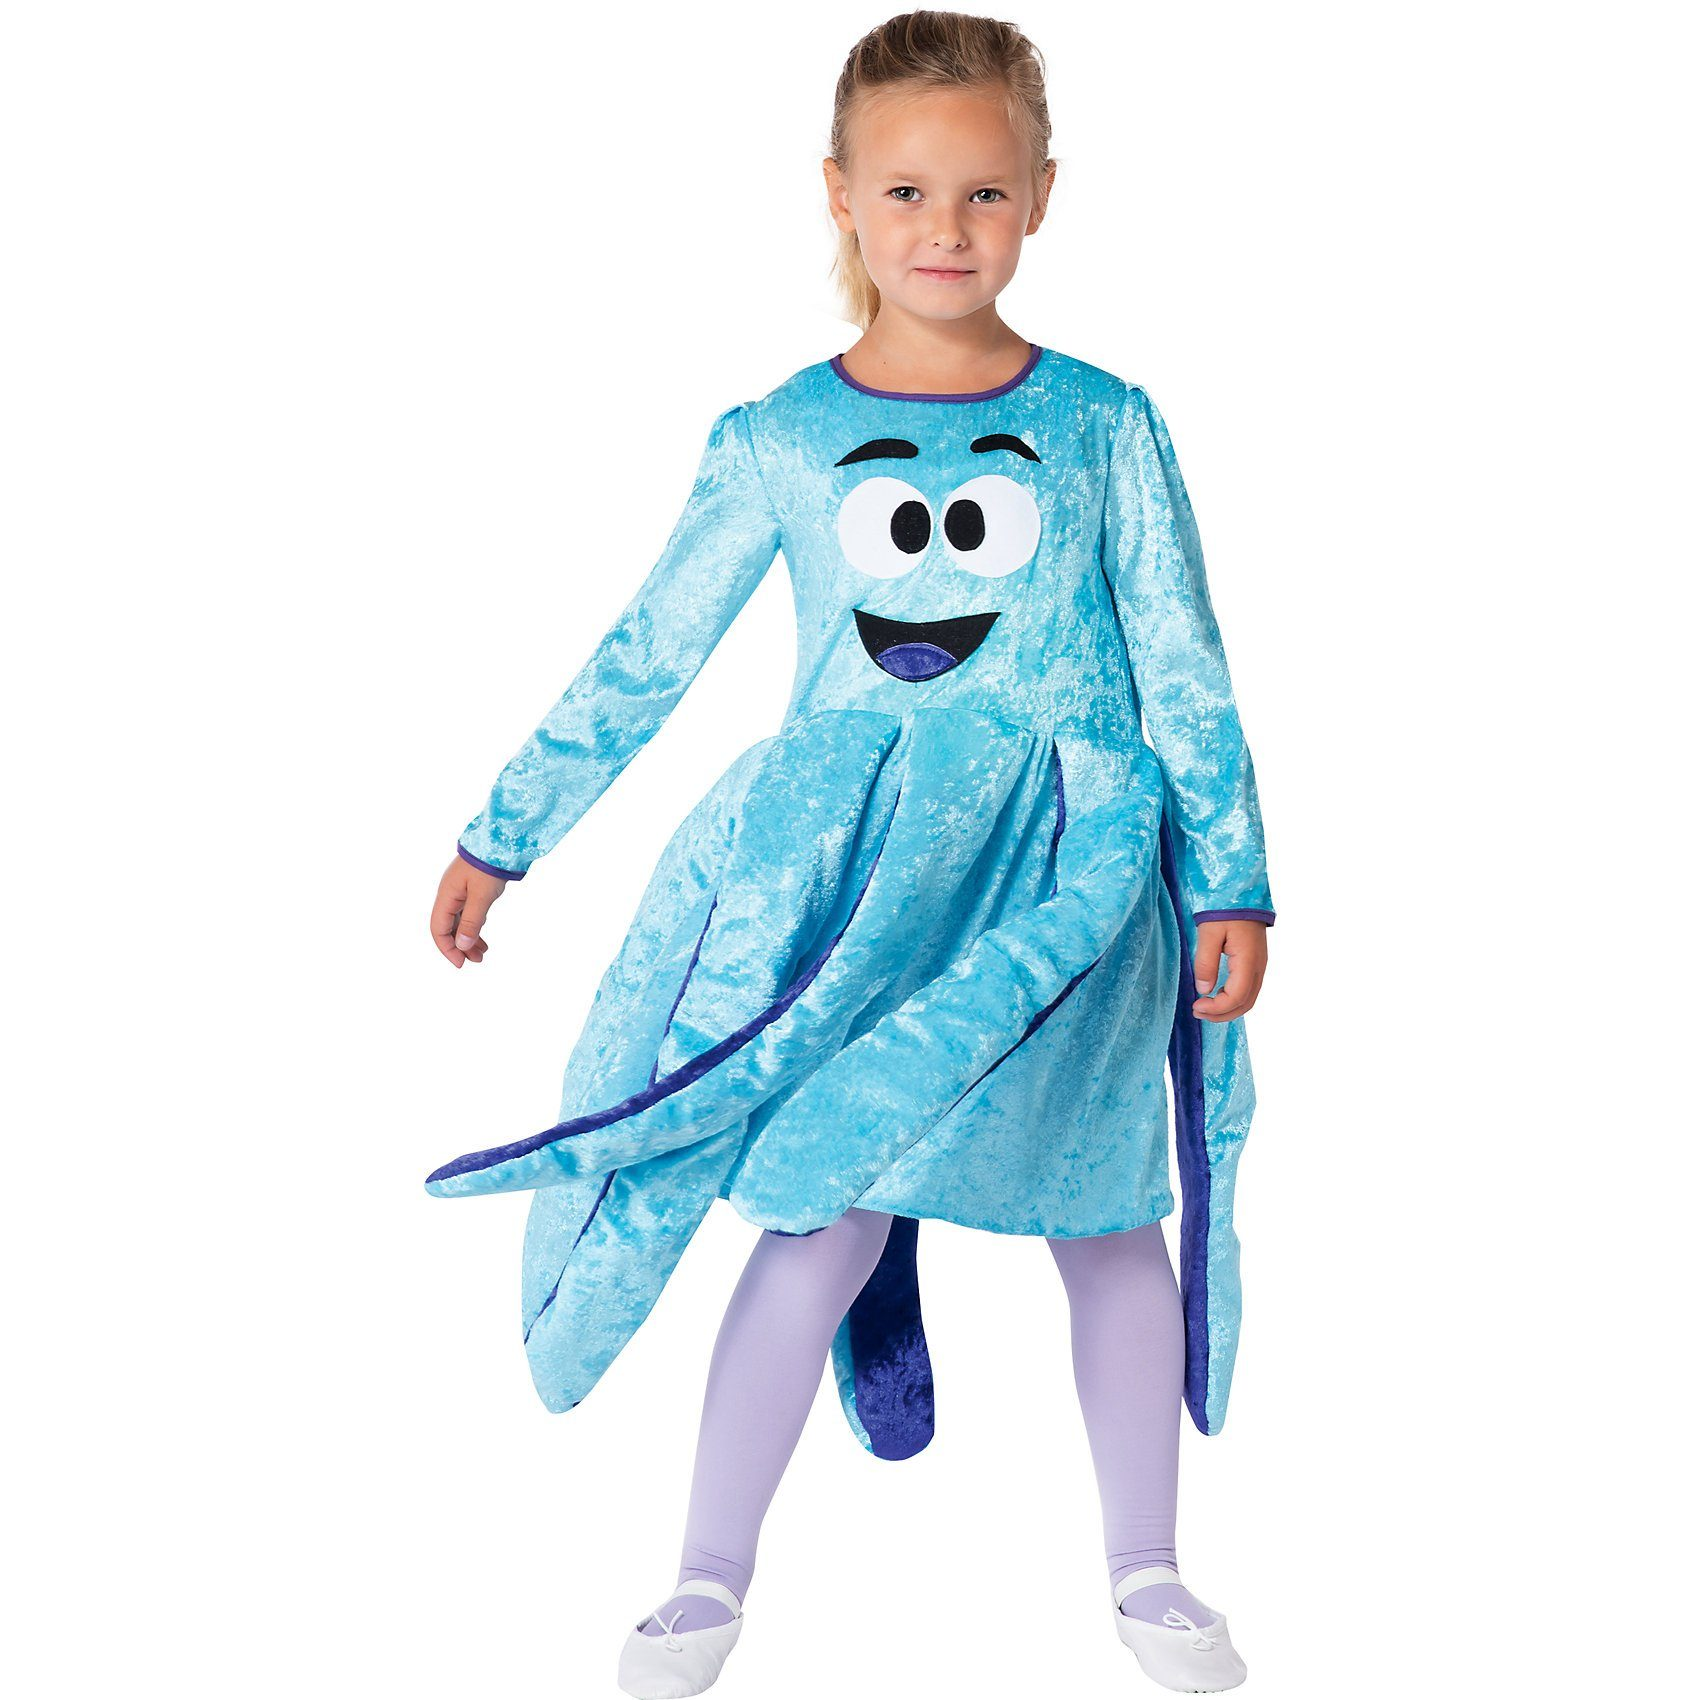 Unisex Kostüm Oktopuskleid türkis/lila grün | 04260028383165